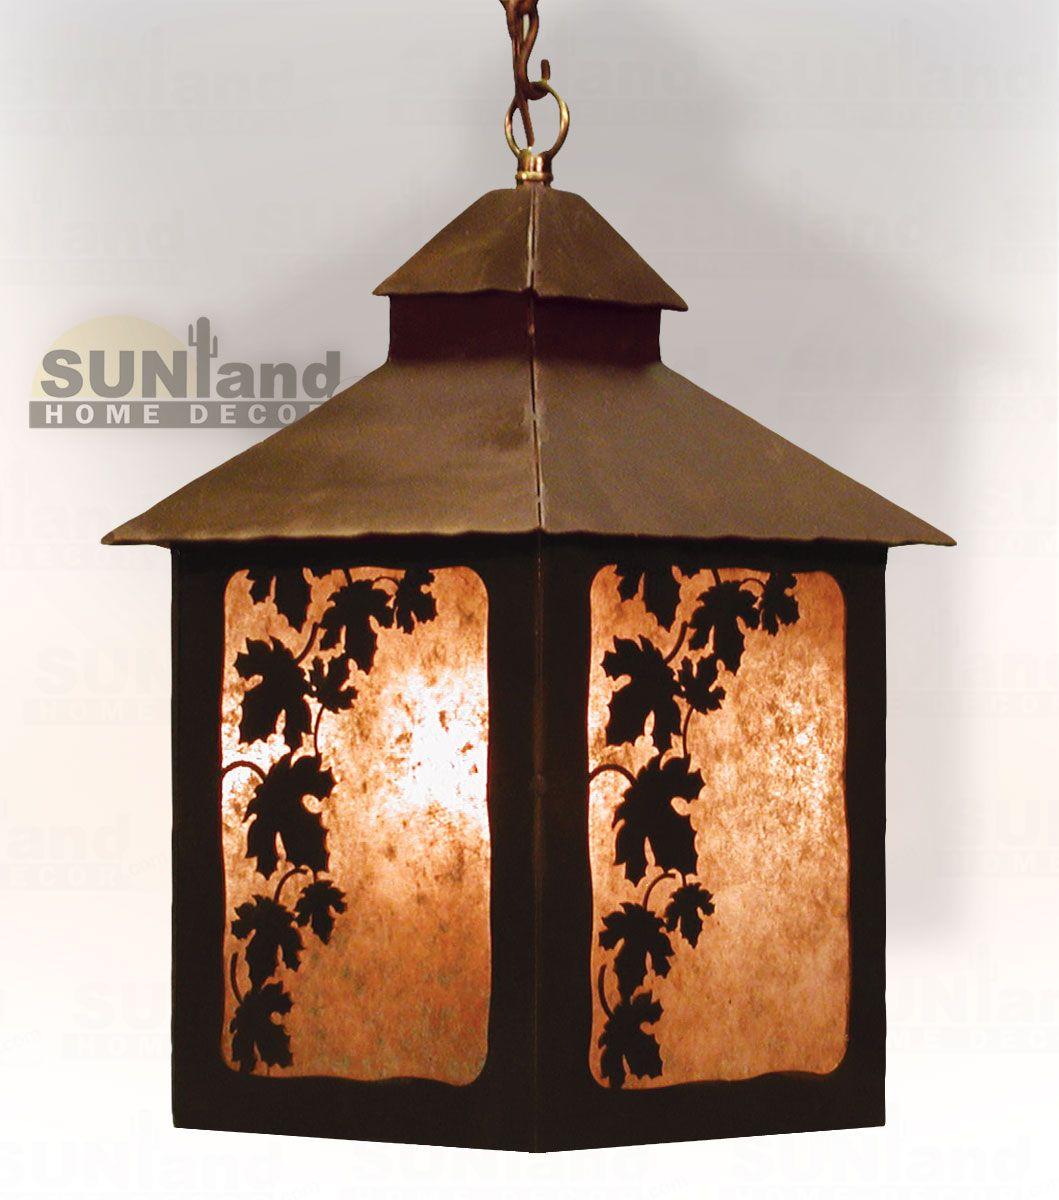 SunlandHomeDecor Lantern Pendant Light Fixture